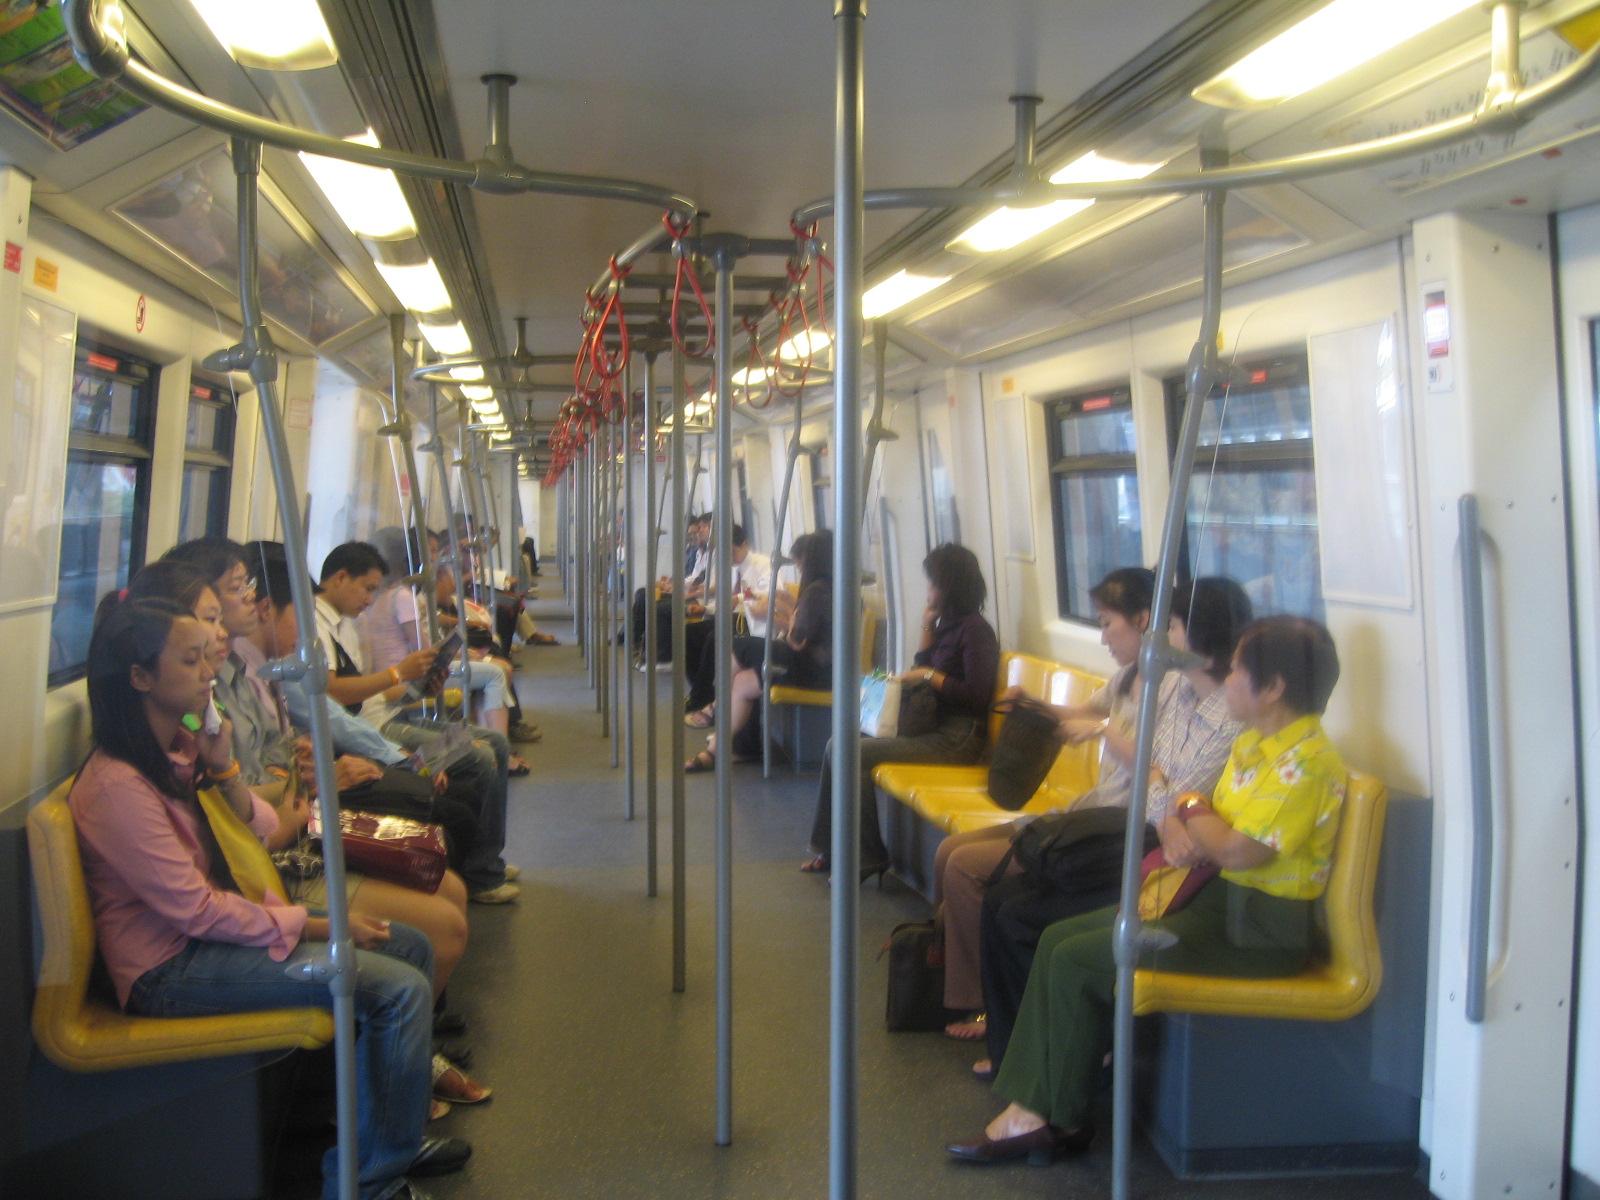 File:Bangkok Skytrain interior.JPG